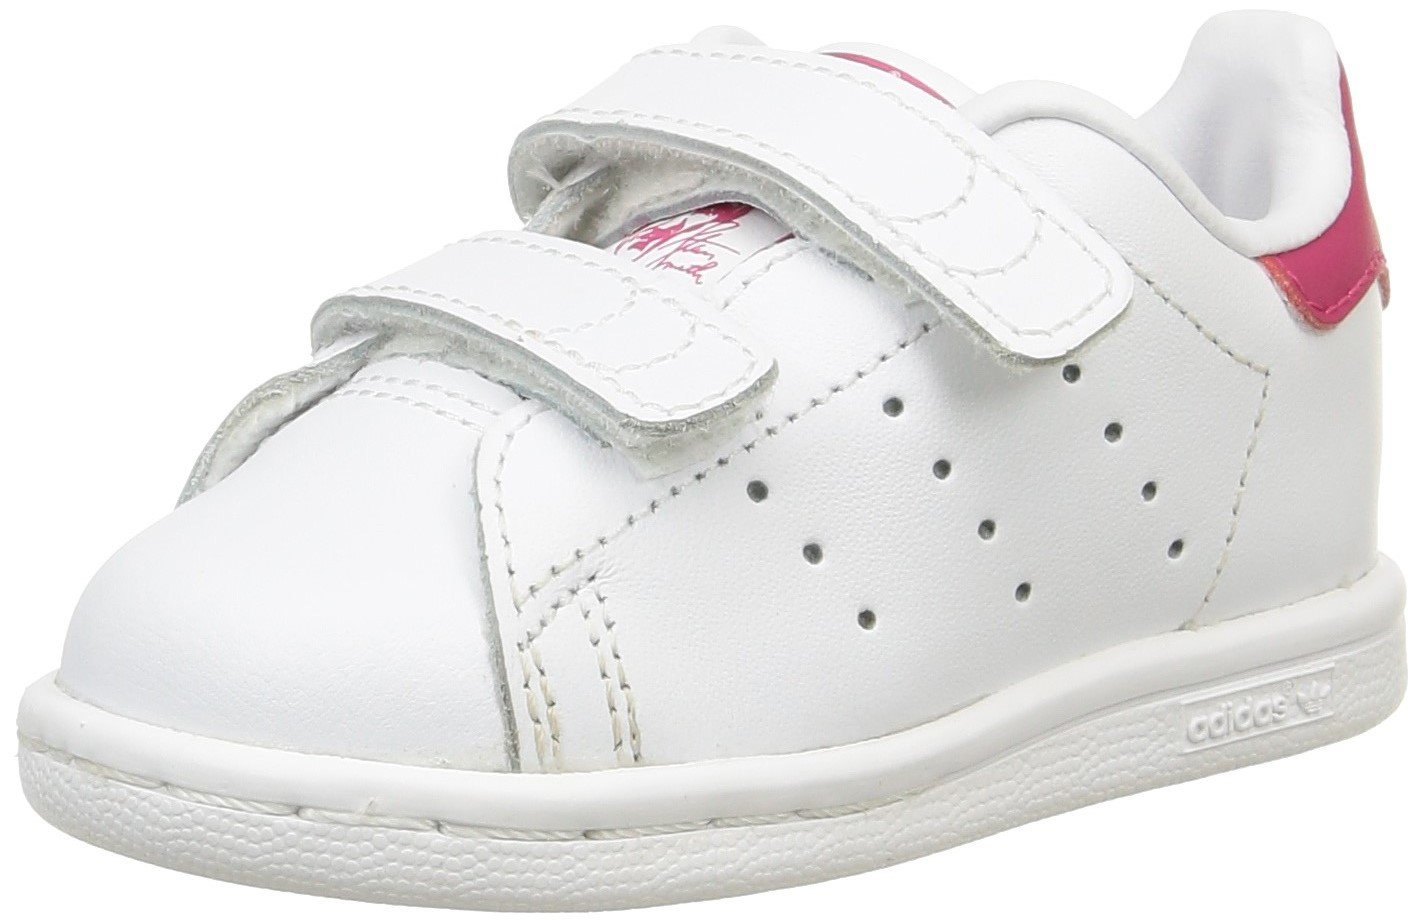 adidas B32704, Unisex Kids' Tennis Shoes adidas Originals